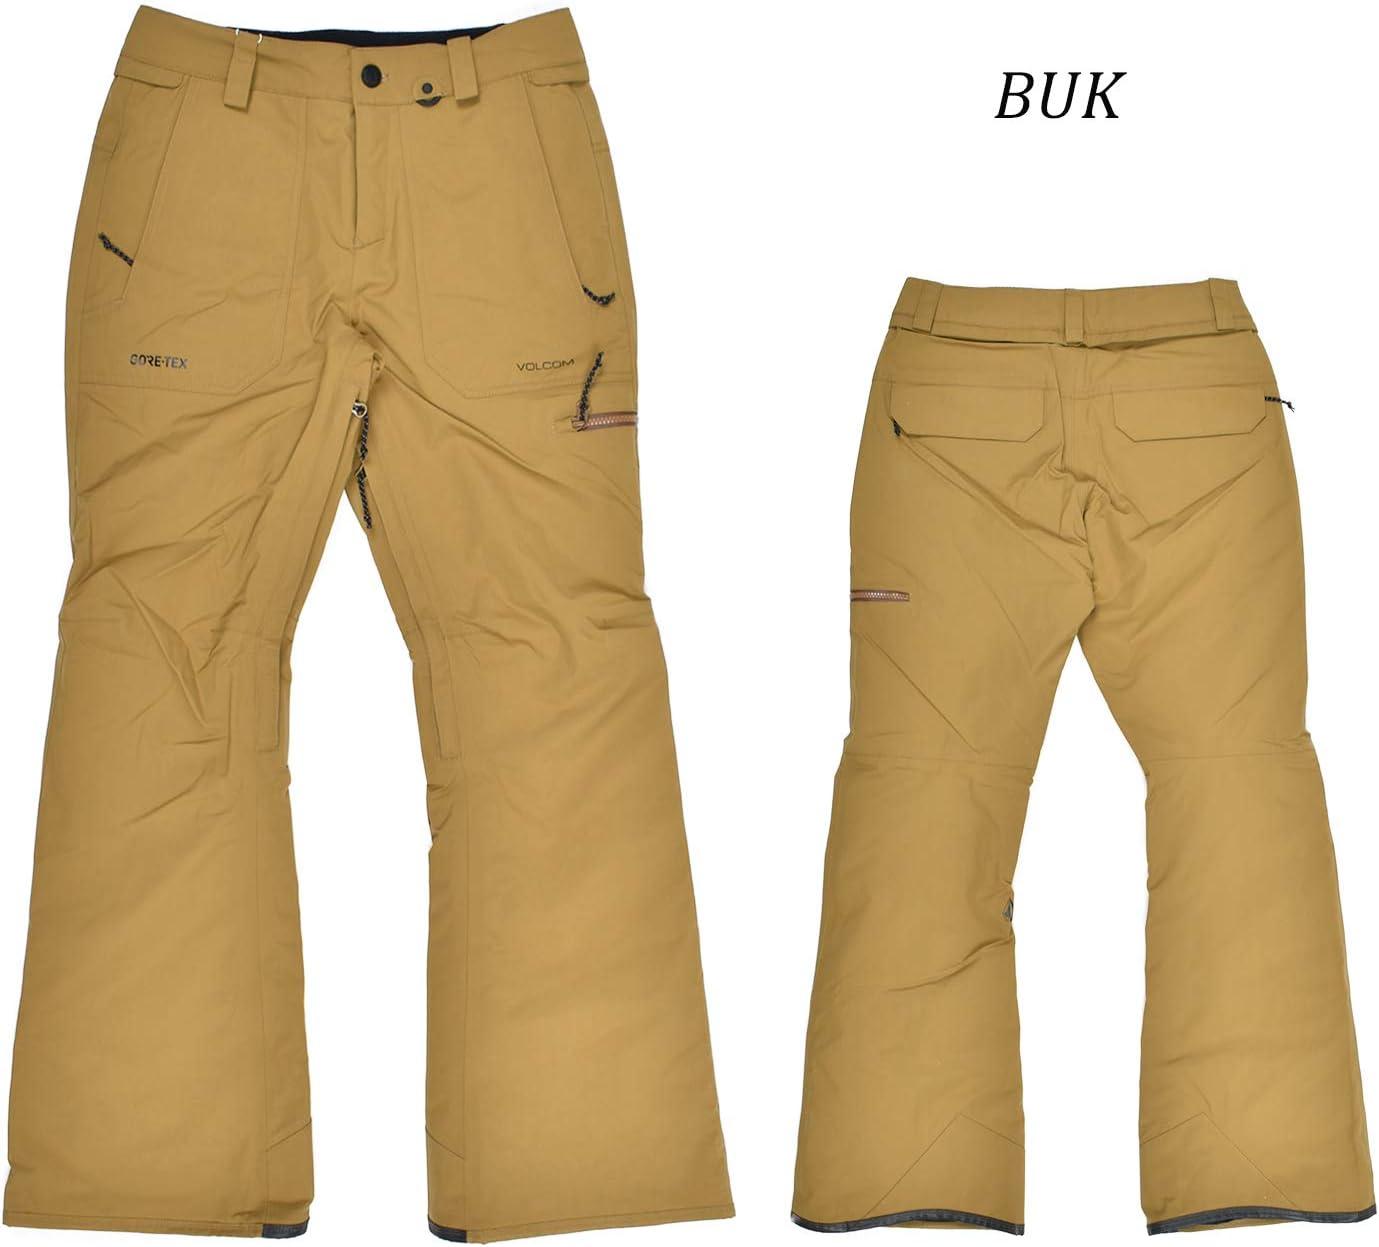 Volcom Knox Insulated Gore-Tex Snowboard Pants Womens Sz M Burnt Khaki